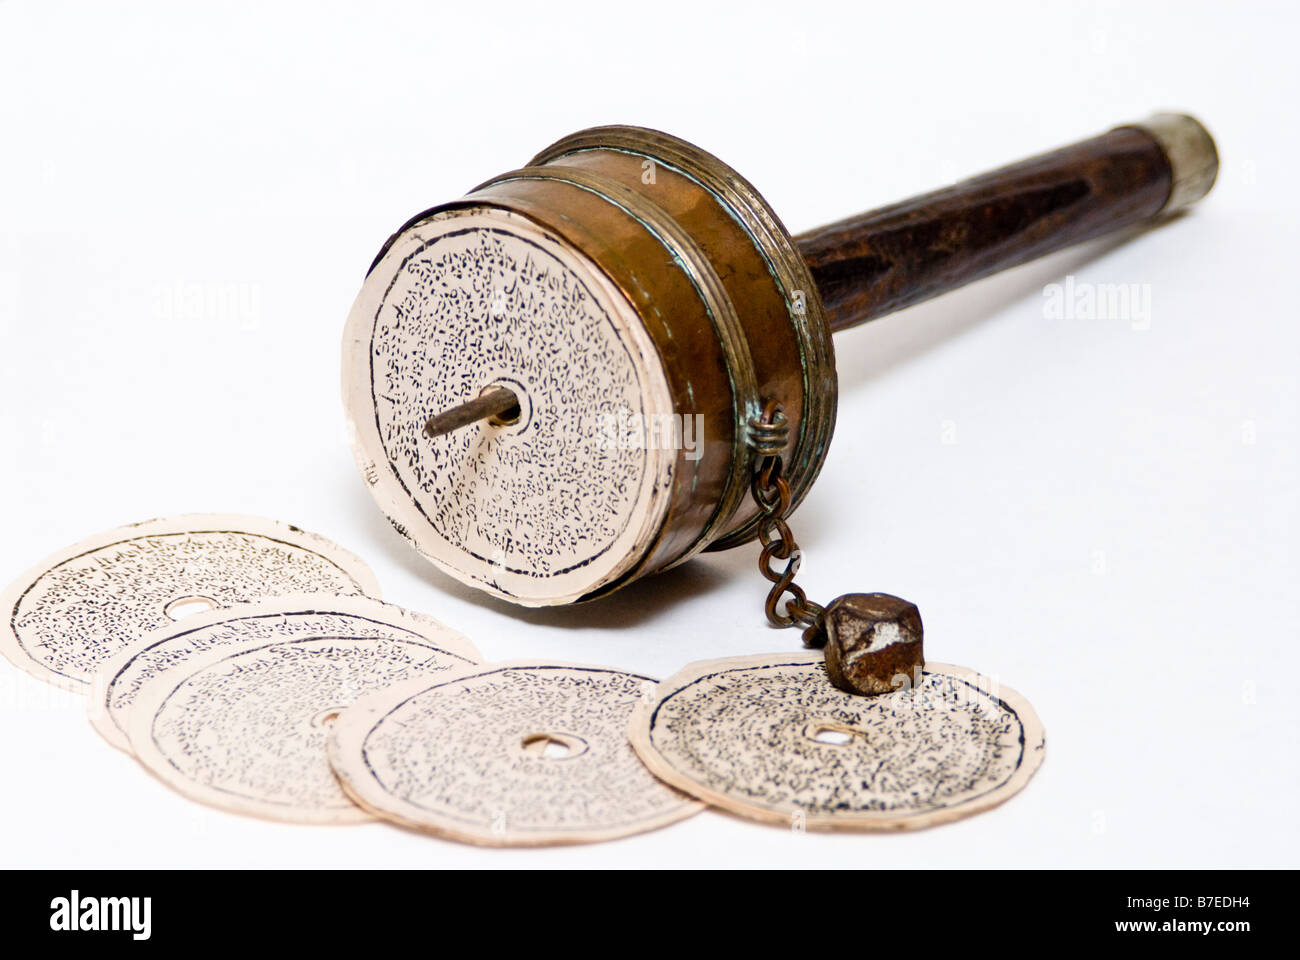 Antique Tibetan Prayer Wheel - Stock Image